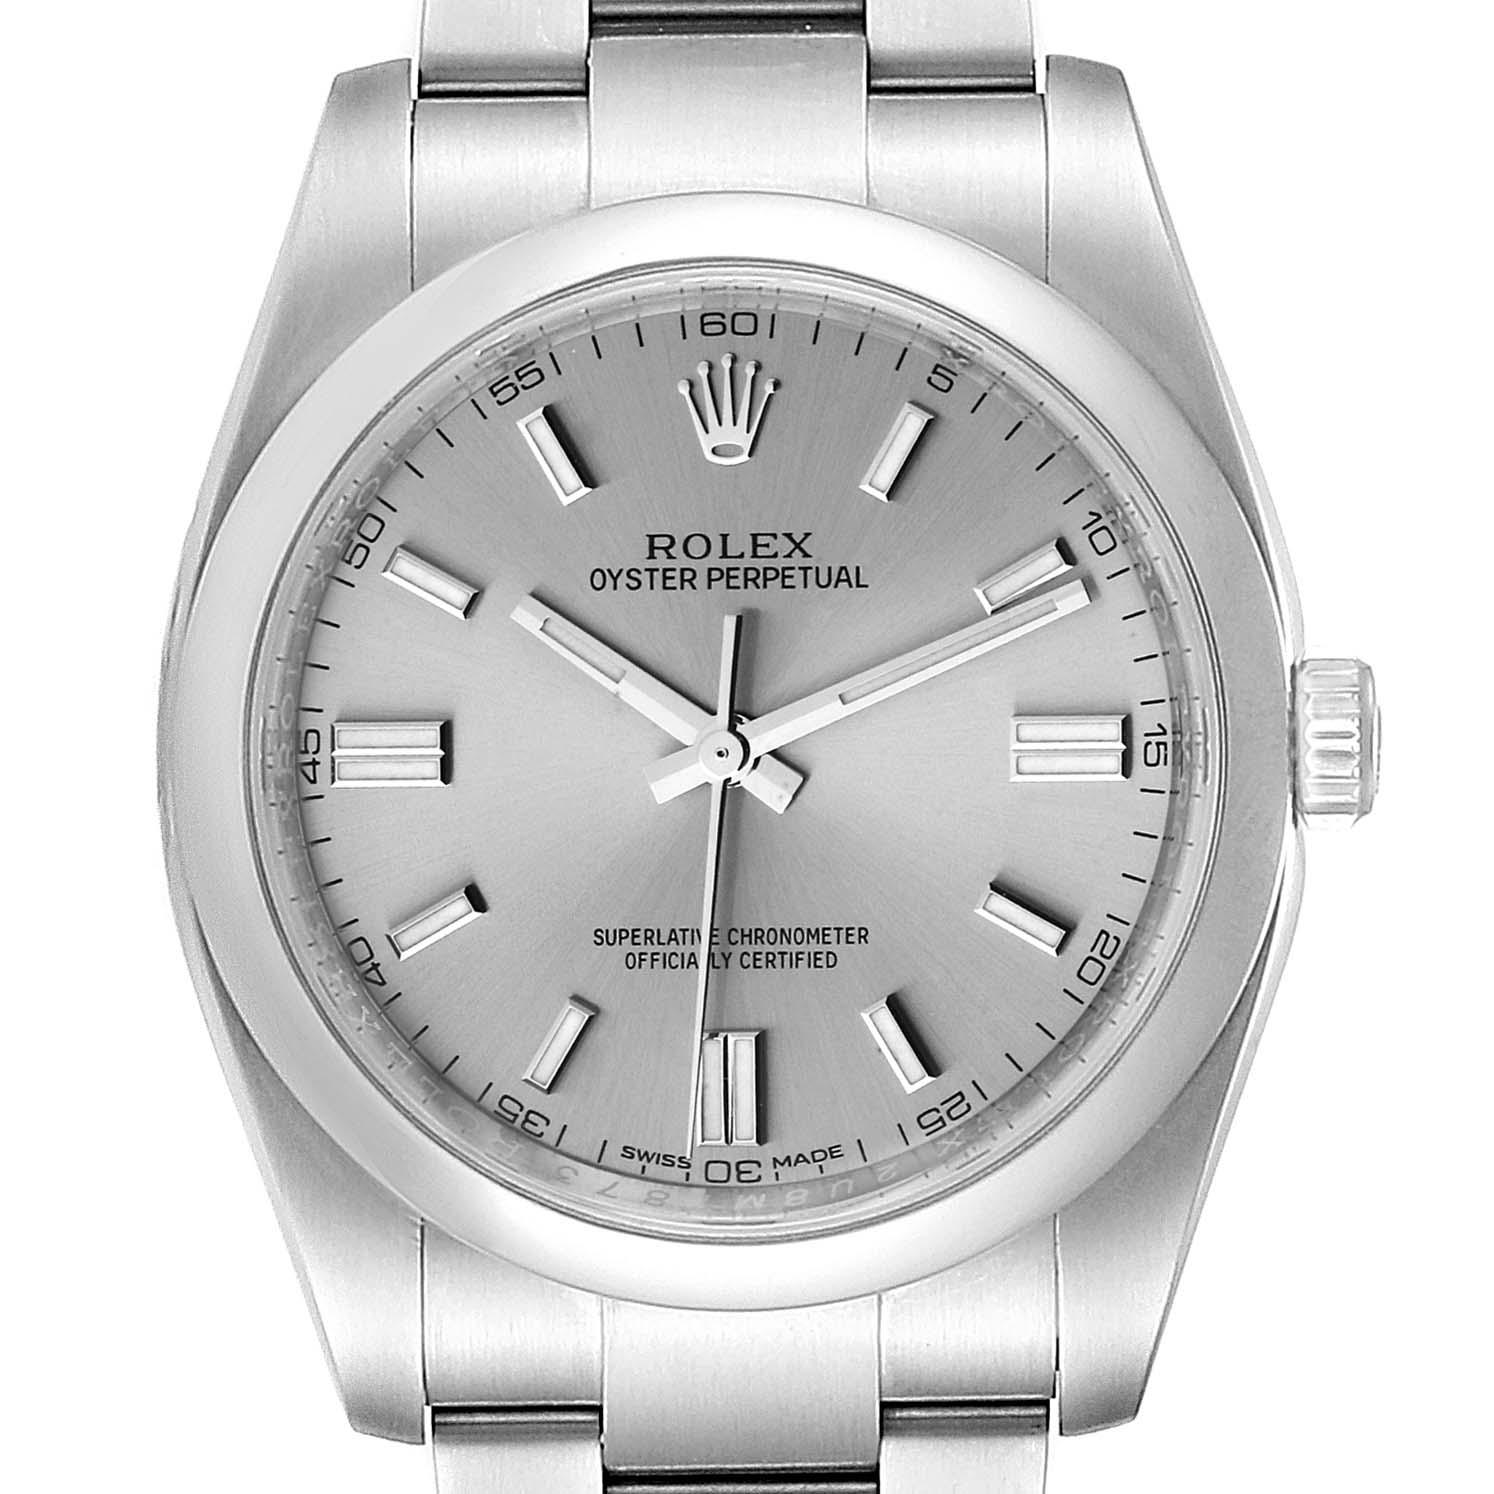 Rolex Oyster Perpetual 36 Rhodium Dial Steel Mens Watch 116000 Box Card